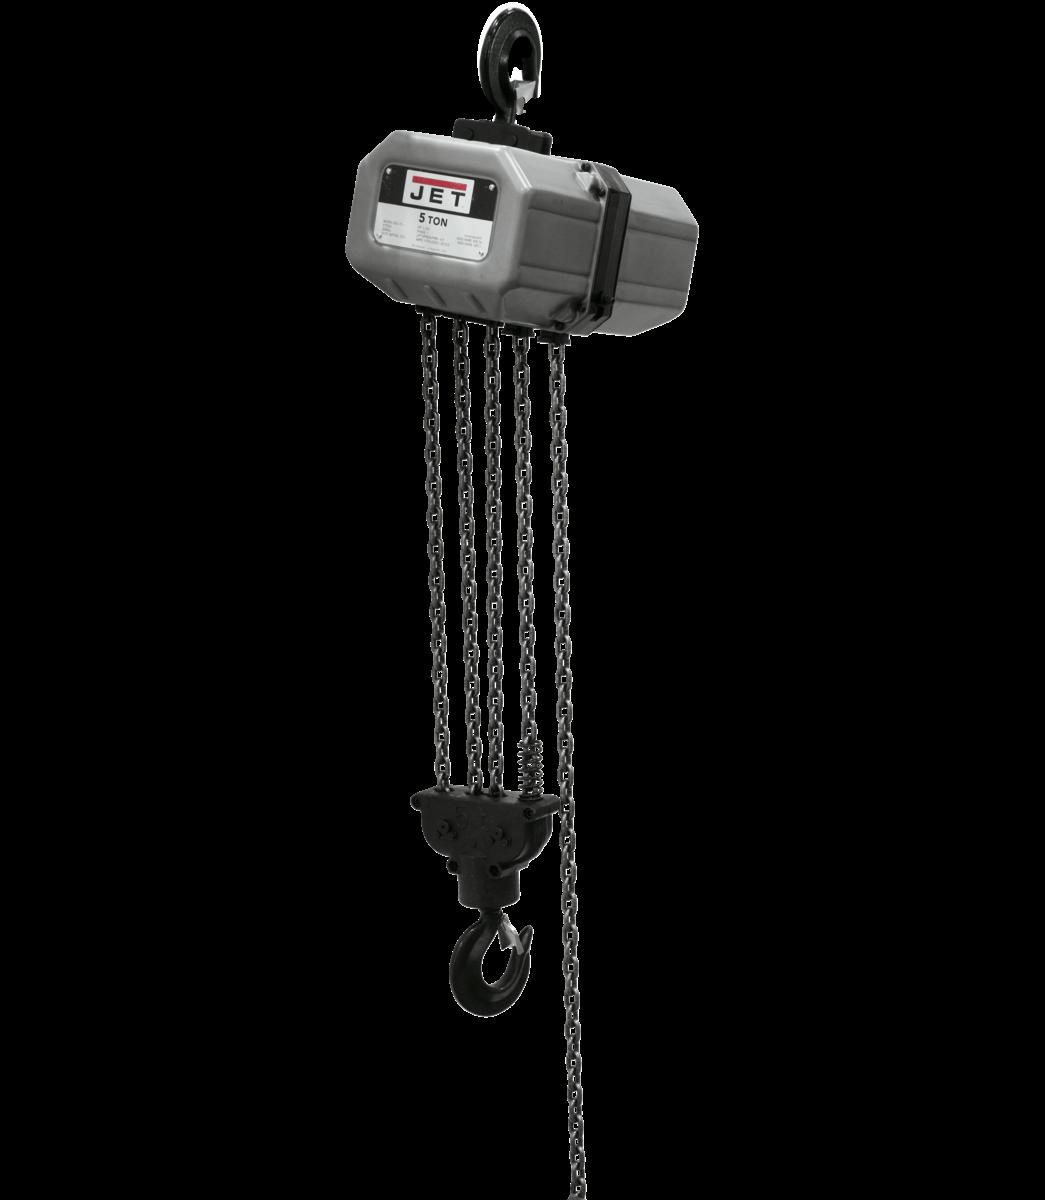 5SS-3C-10, 5-Ton Electric Chain Hoist 3-Phase 10' lift